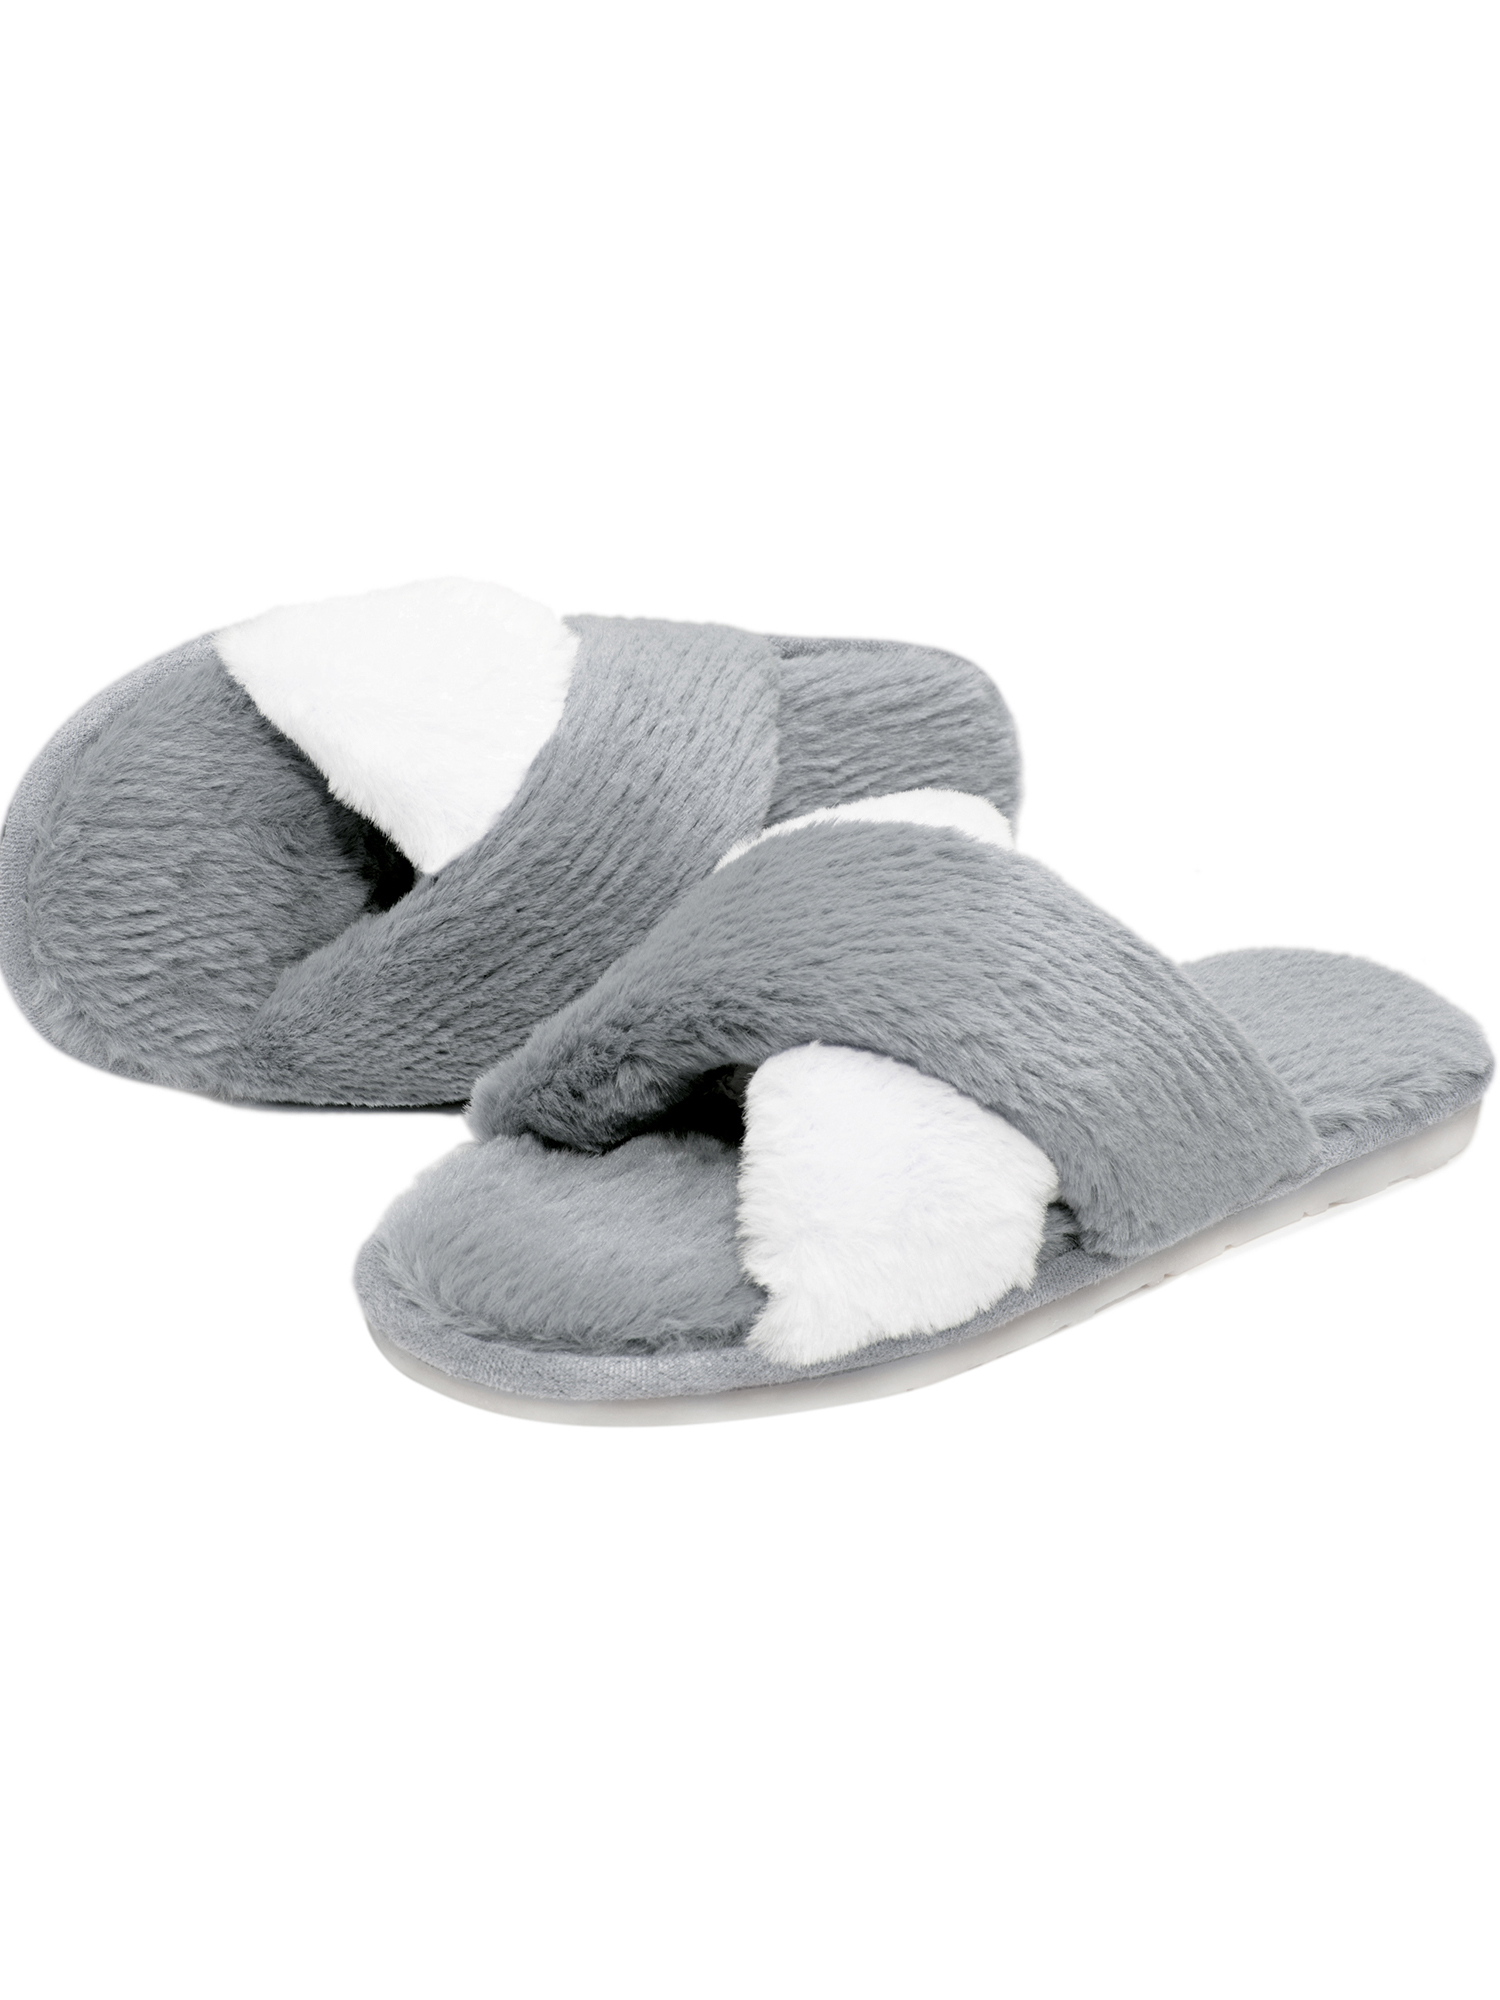 Florata - Women's Slippers Flip Flop